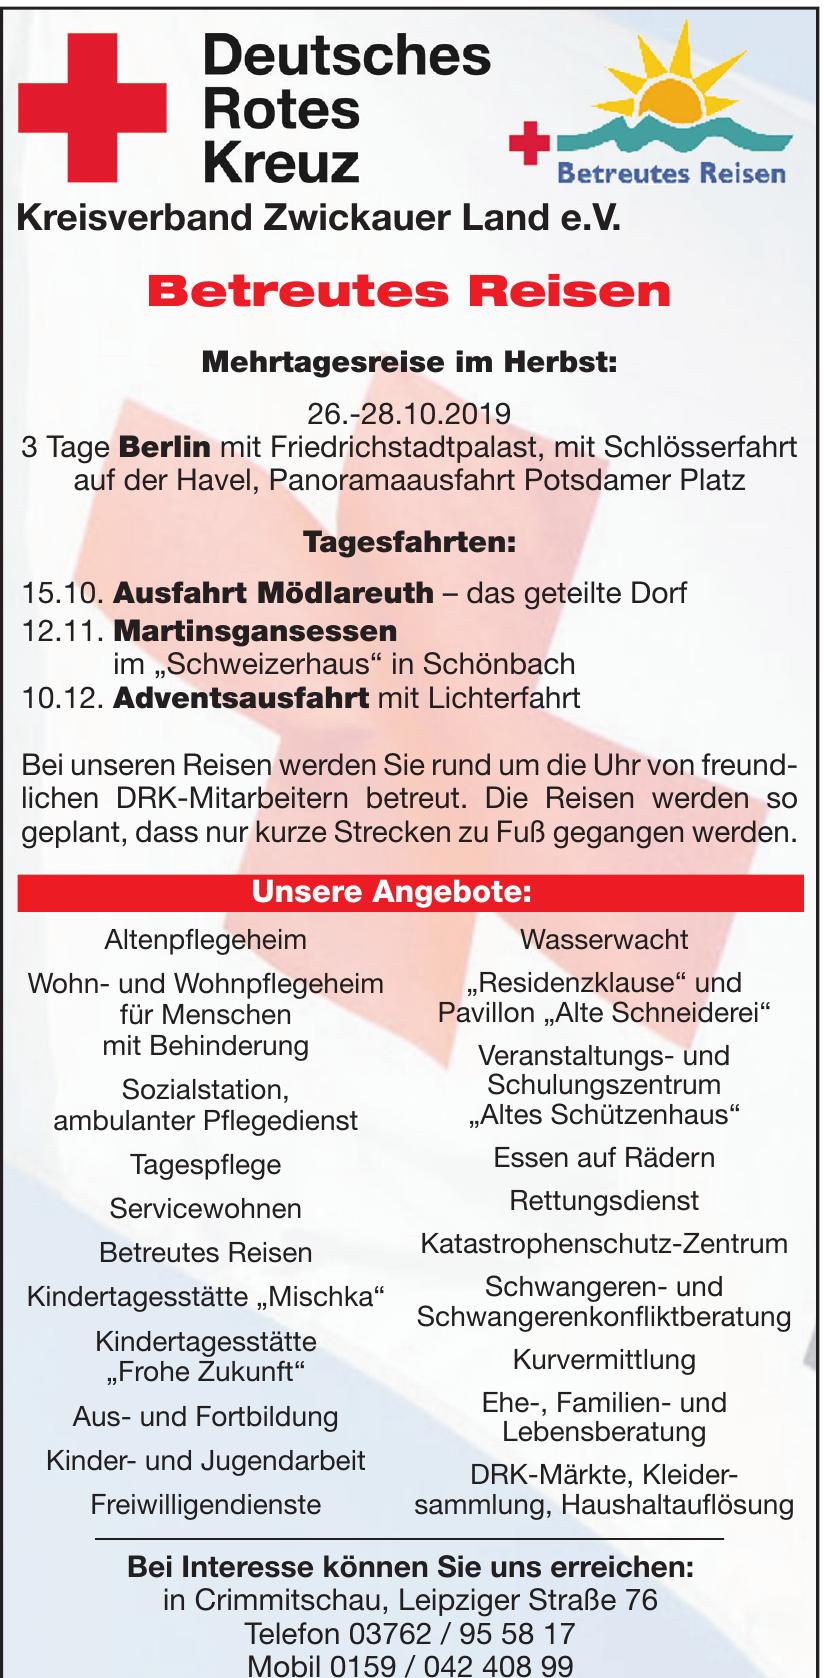 Deutsches Rotes Kreuz Kreisverband Zwickauer Land e.V.